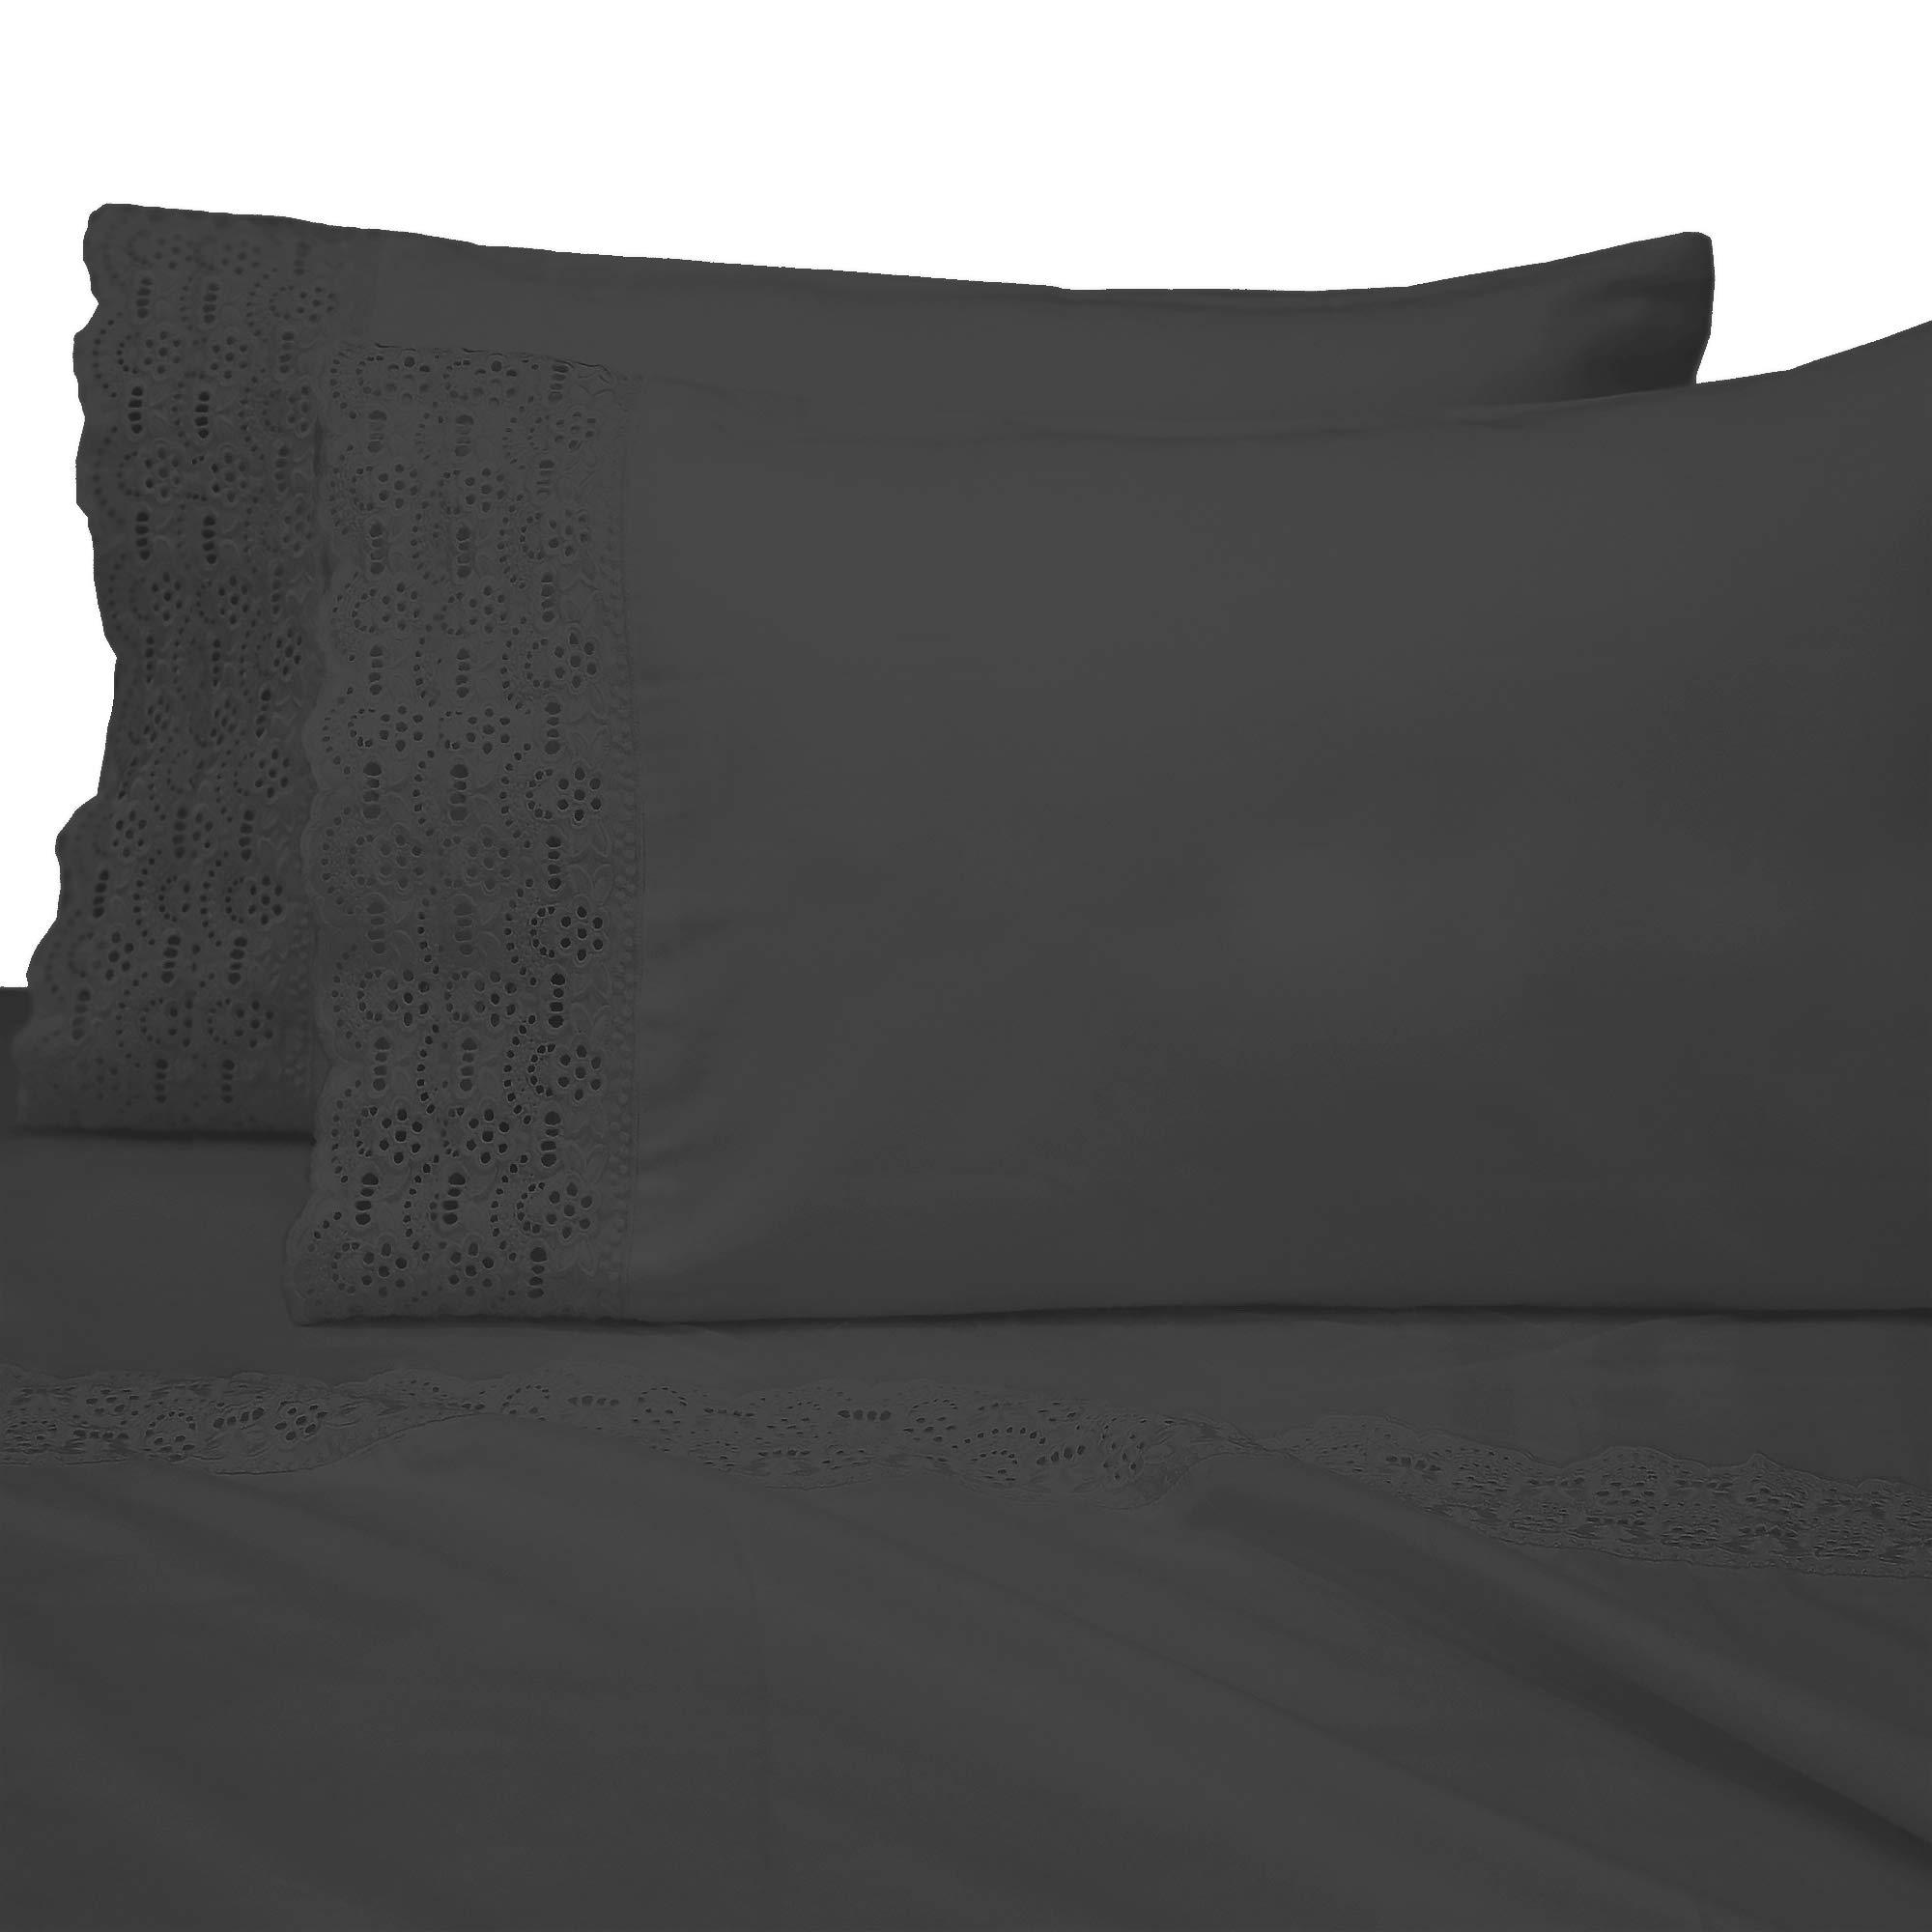 "AURAA Smart 600 Thread Count Cotton Rich, 4 Piece Sheet Set, 16"" Deep Pocket, Victoria LACE Hem, Smooth & Soft Sateen Weave, Hotel Quality (Victoria Charcoal, Split King)"